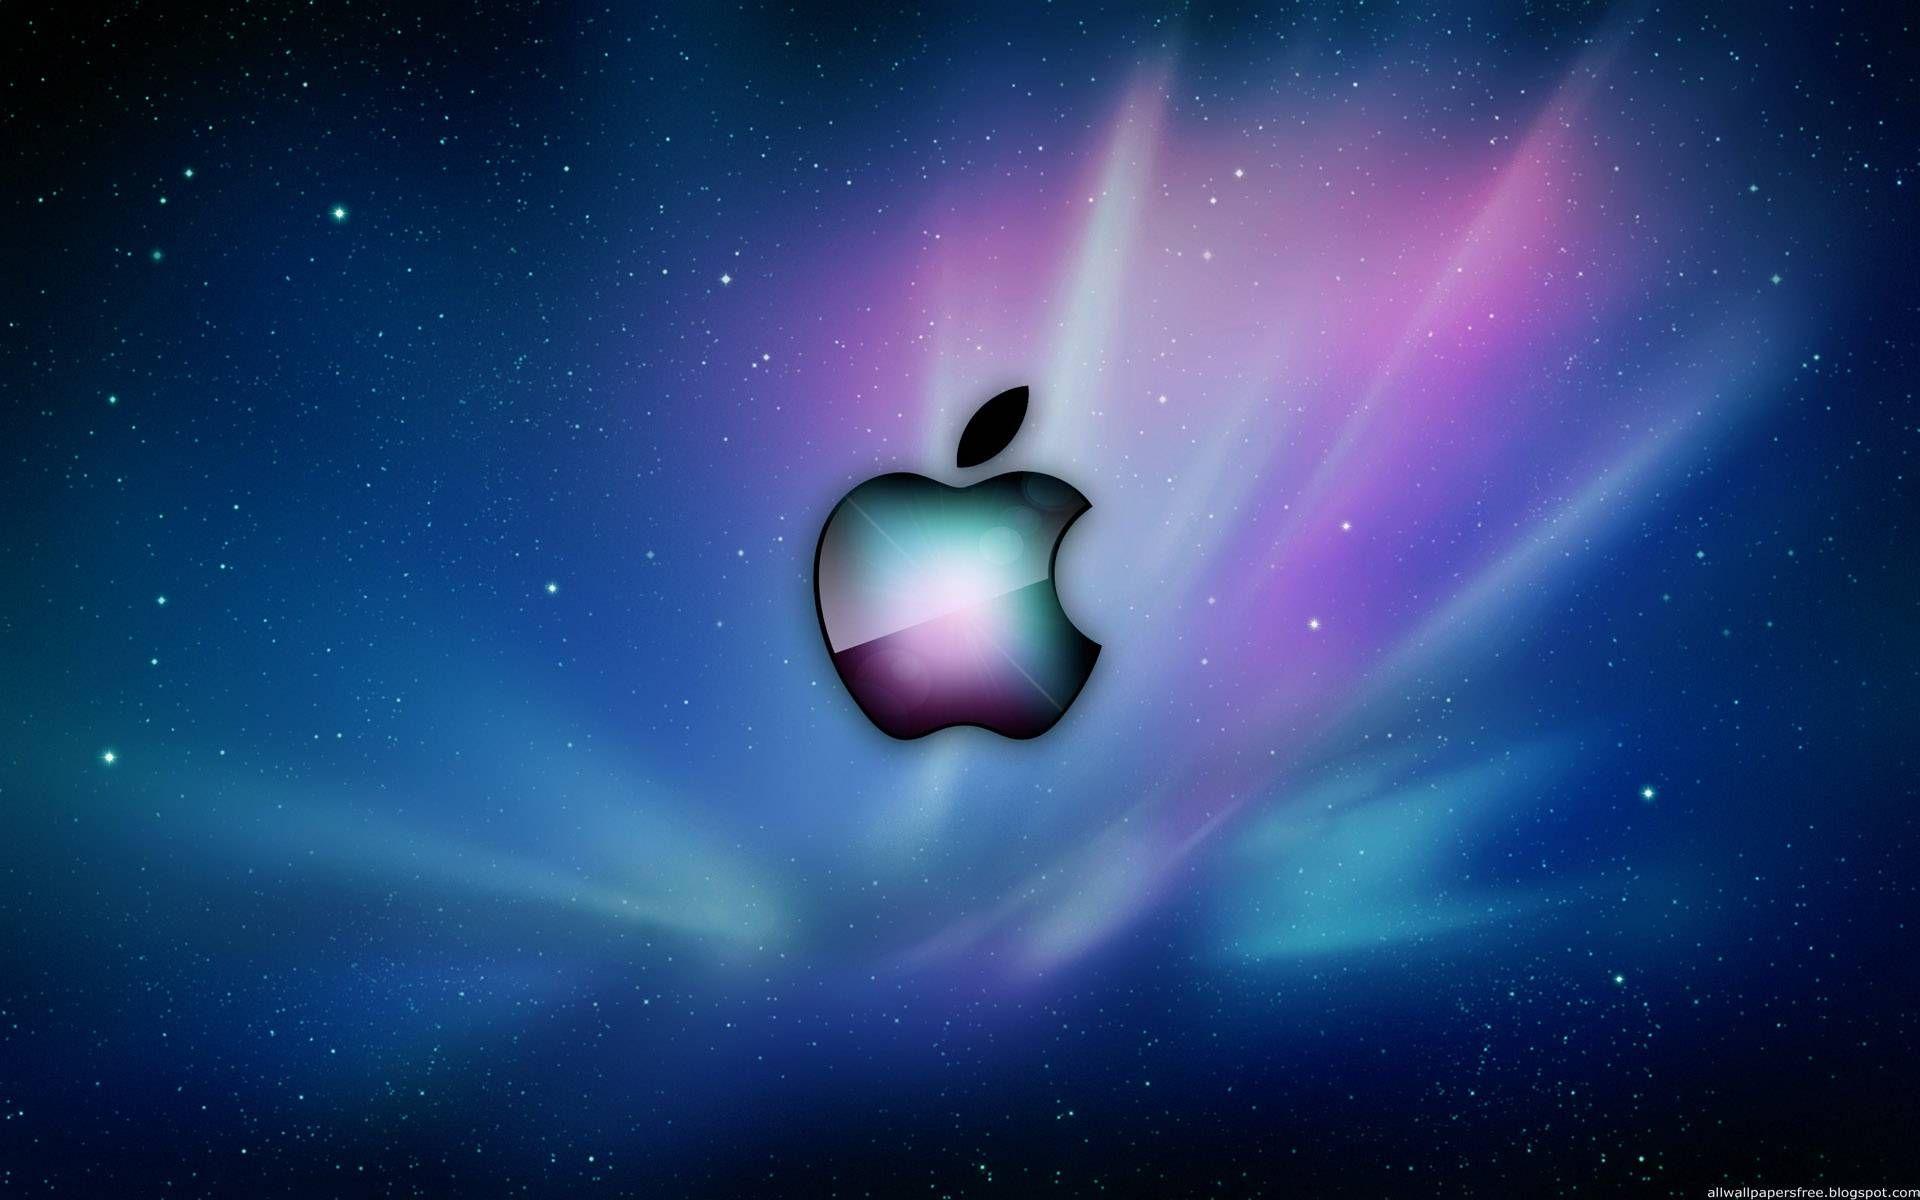 Wallpaper download apple - Amazing Apple Hd Apple Wallpaper